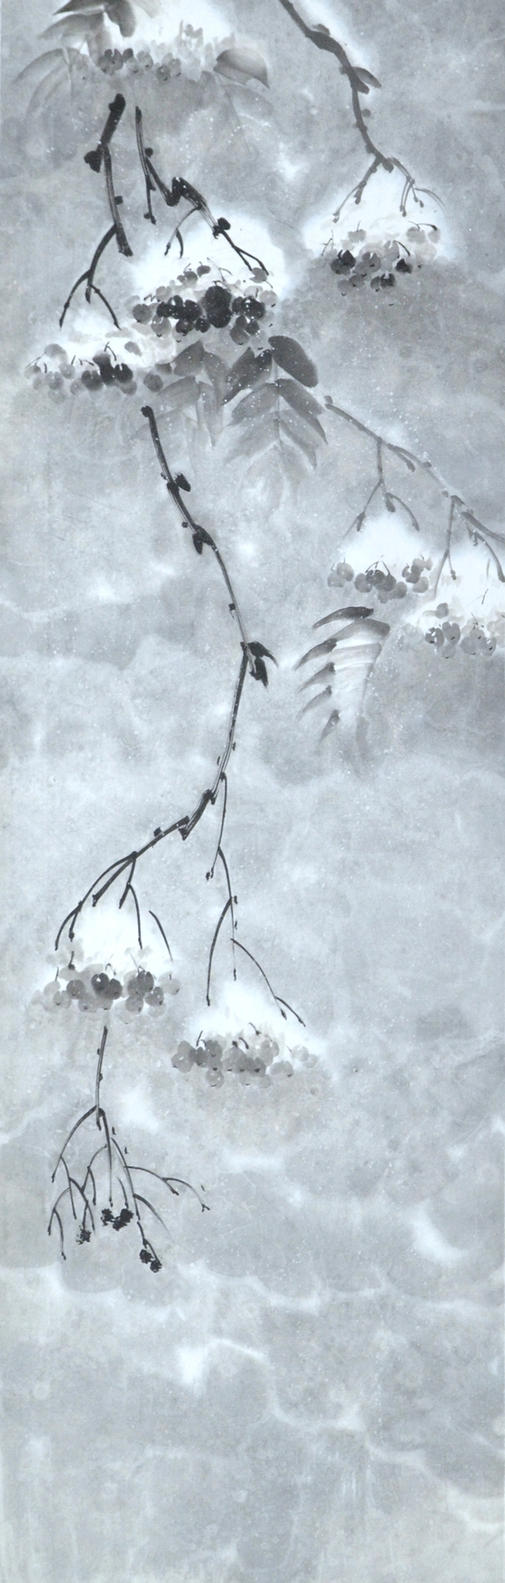 Sumie Rowan under snow by bsshka